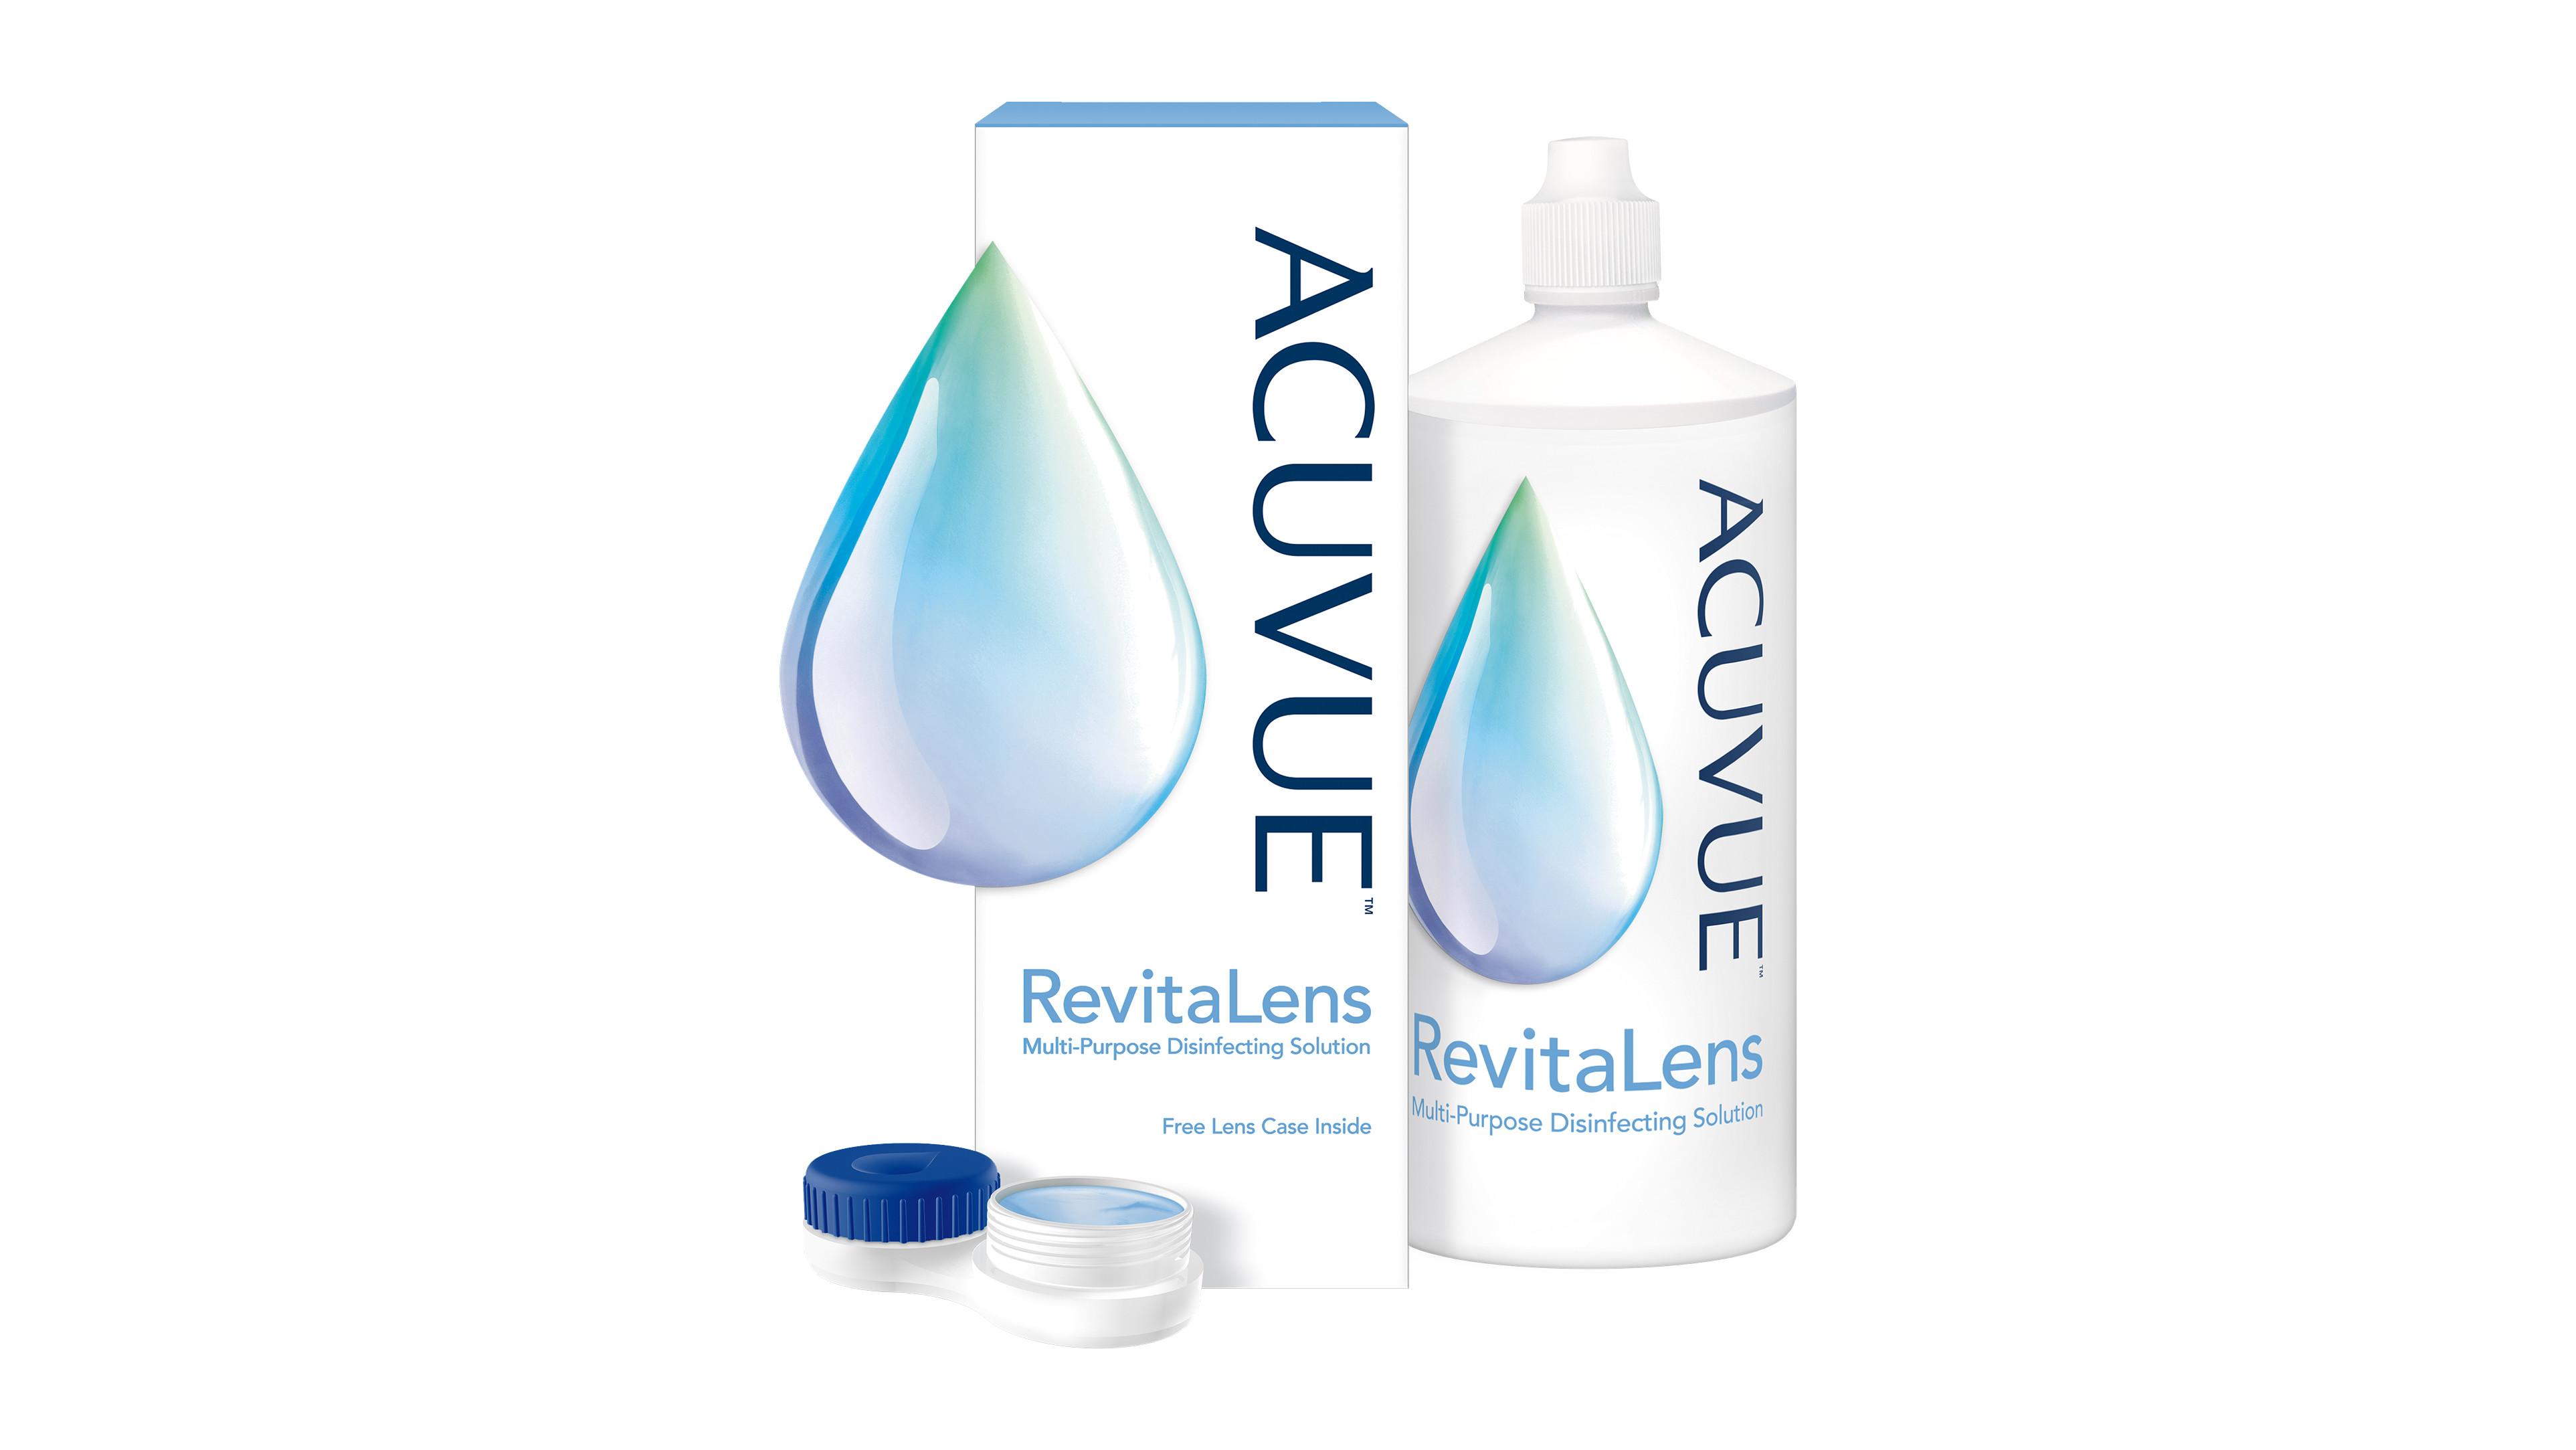 5050474105928-front-kontaktlinsen-pflegemittel-acuvue-revitalens-mpds-300ml